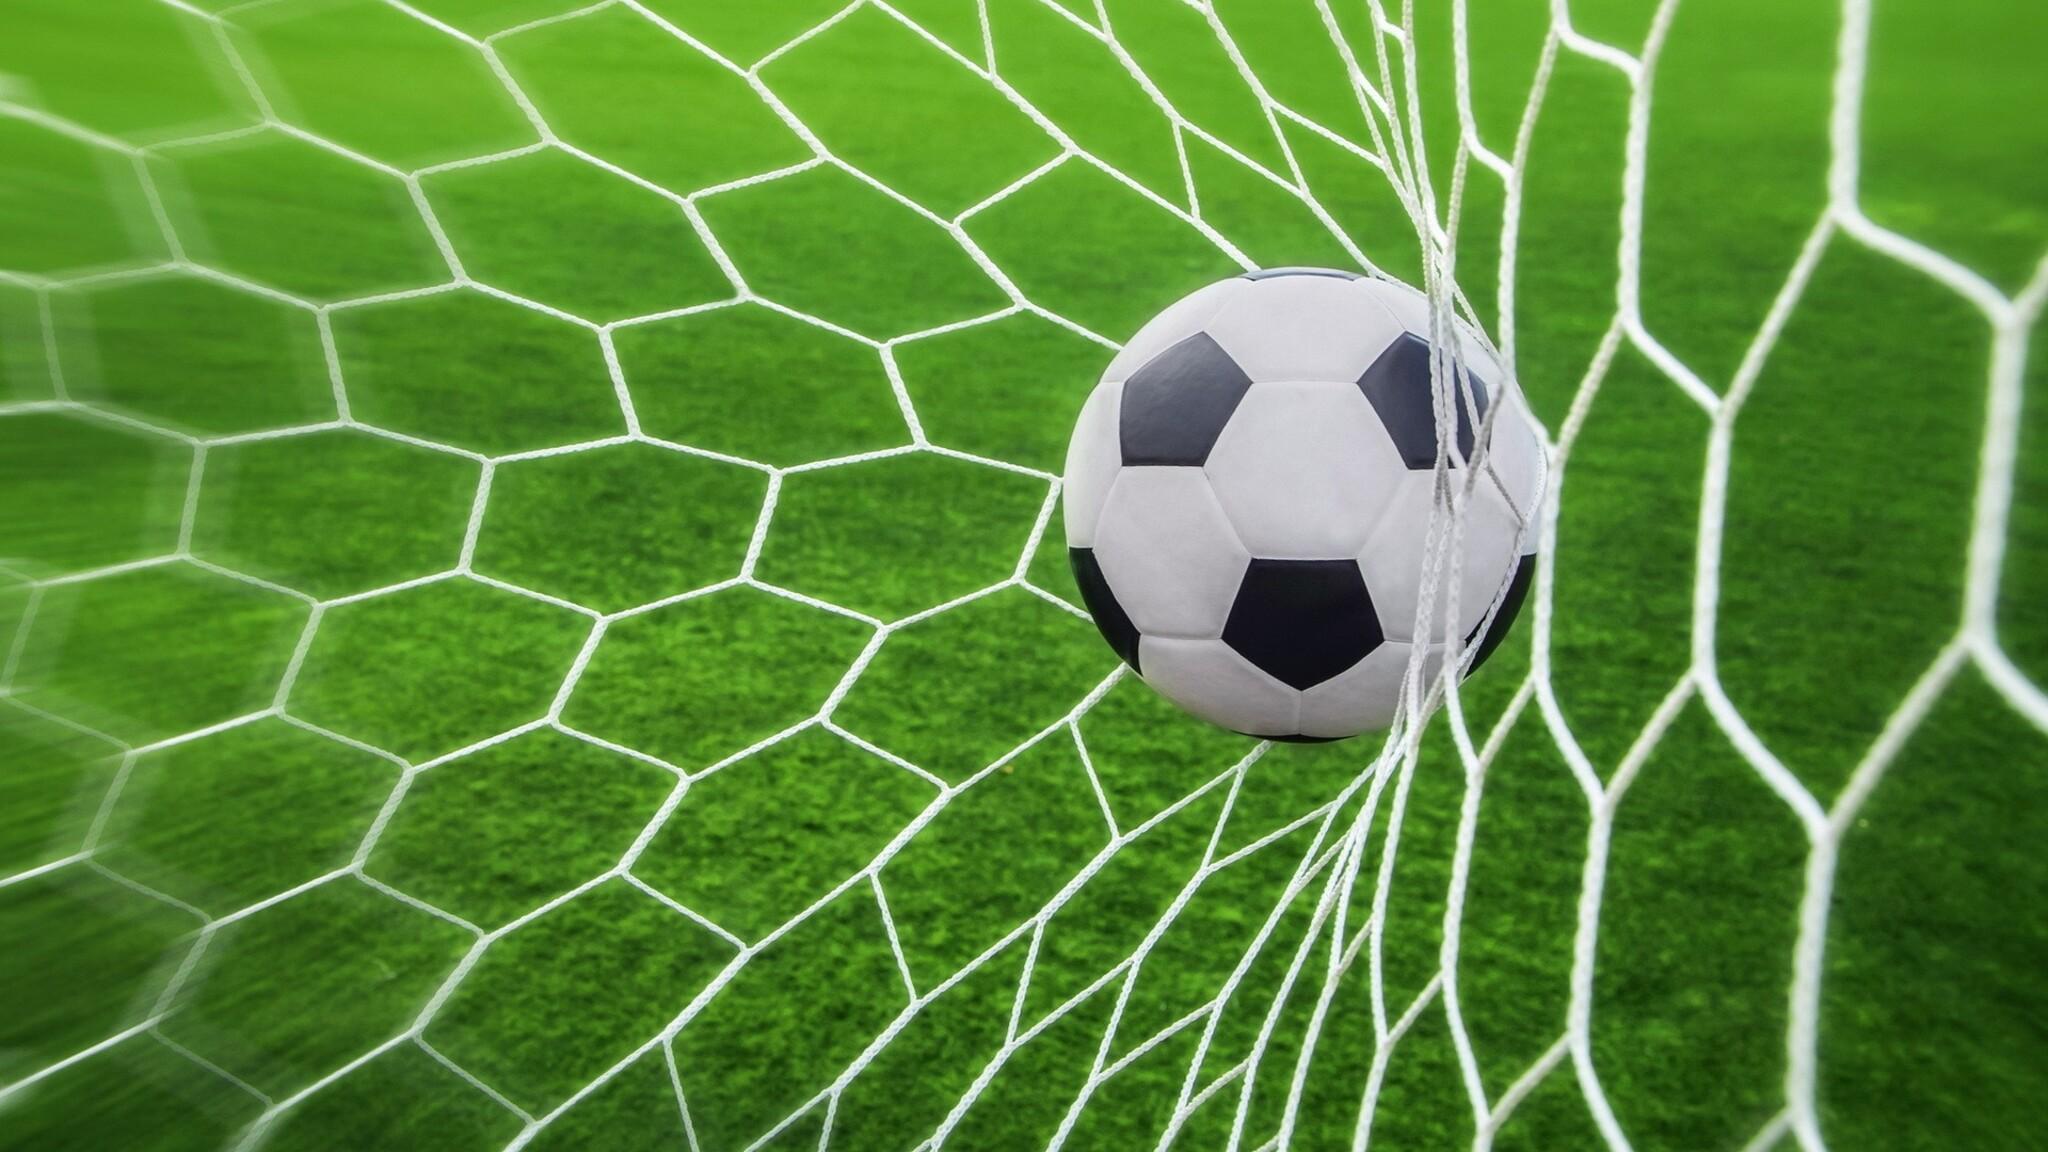 2048x1152 football goal 2048x1152 resolution hd 4k